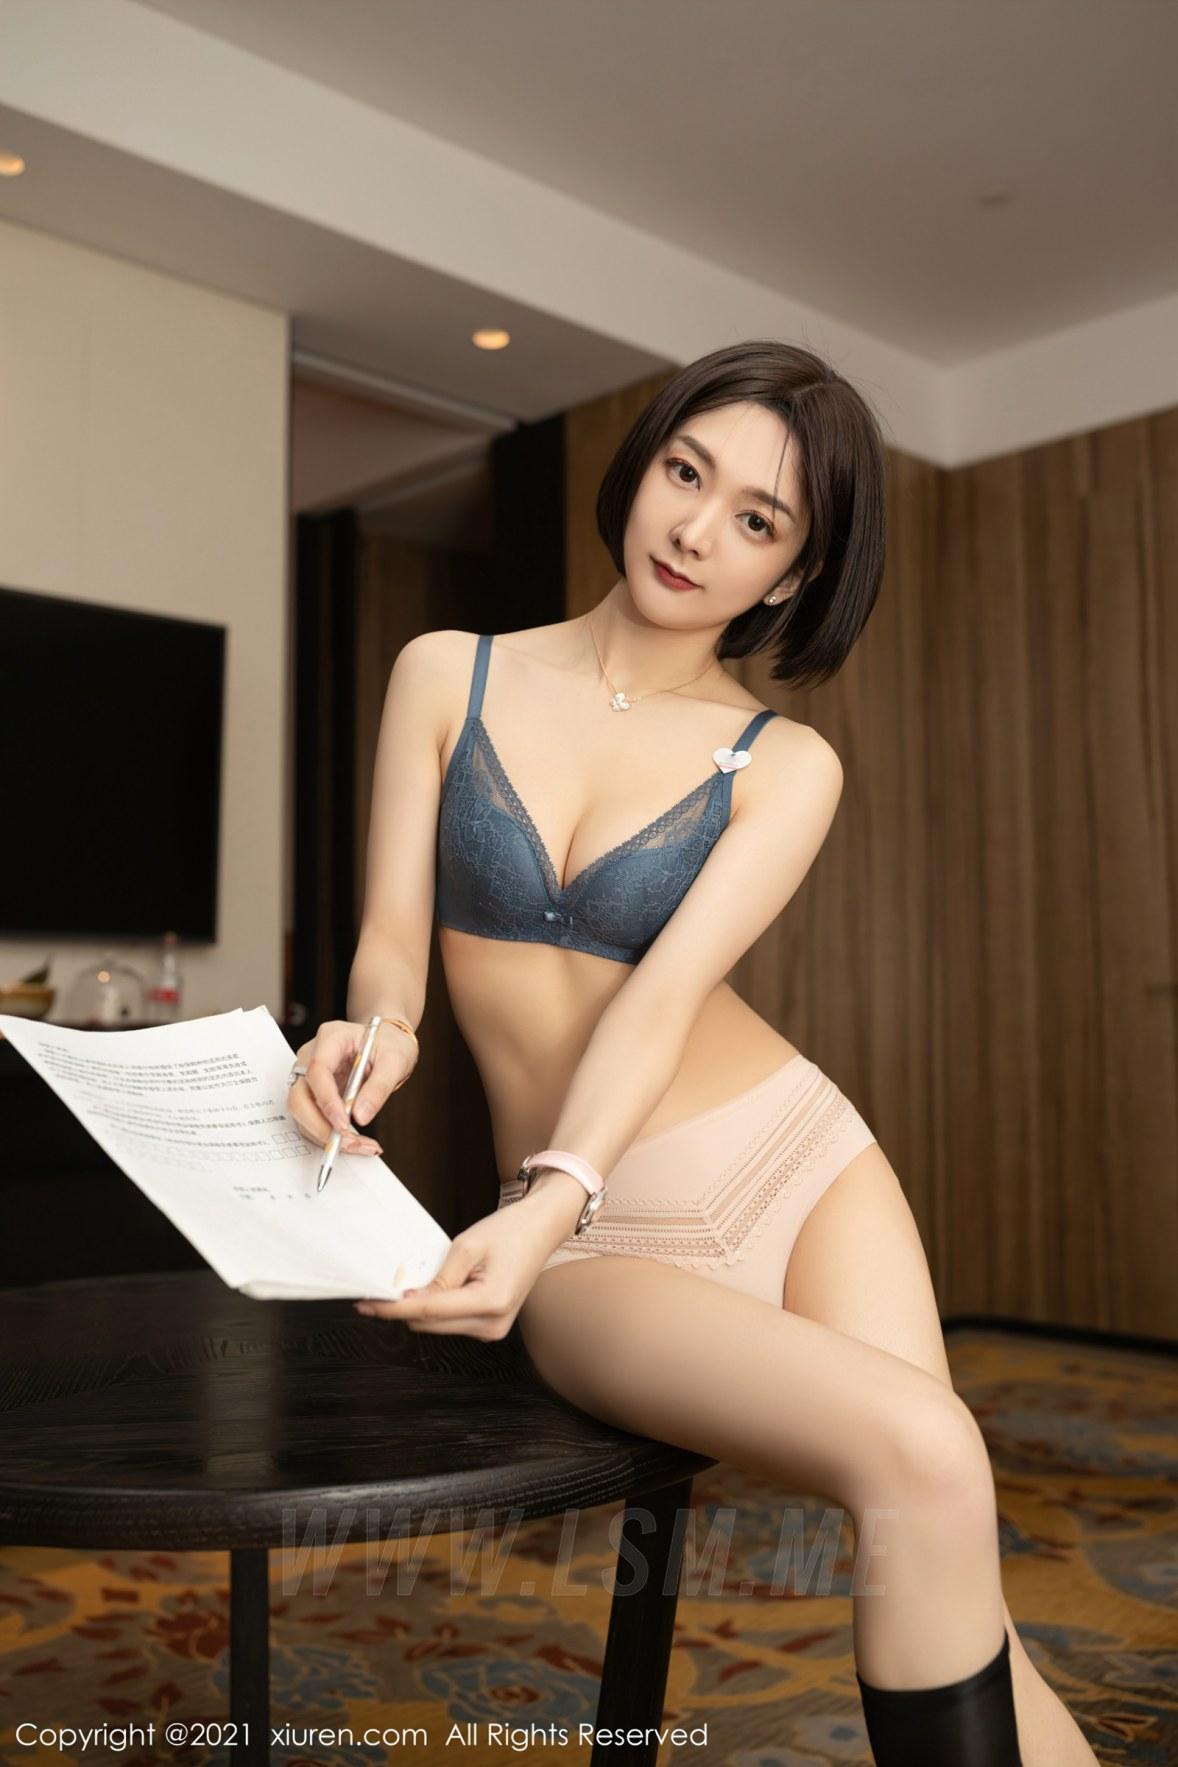 3745 071 fmh 3600 5400 - XiuRen 秀人 No.3745 保险销售主题 Angela小热巴 性感写真33 - 秀人网 -【免费在线写真】【丽人丝语】